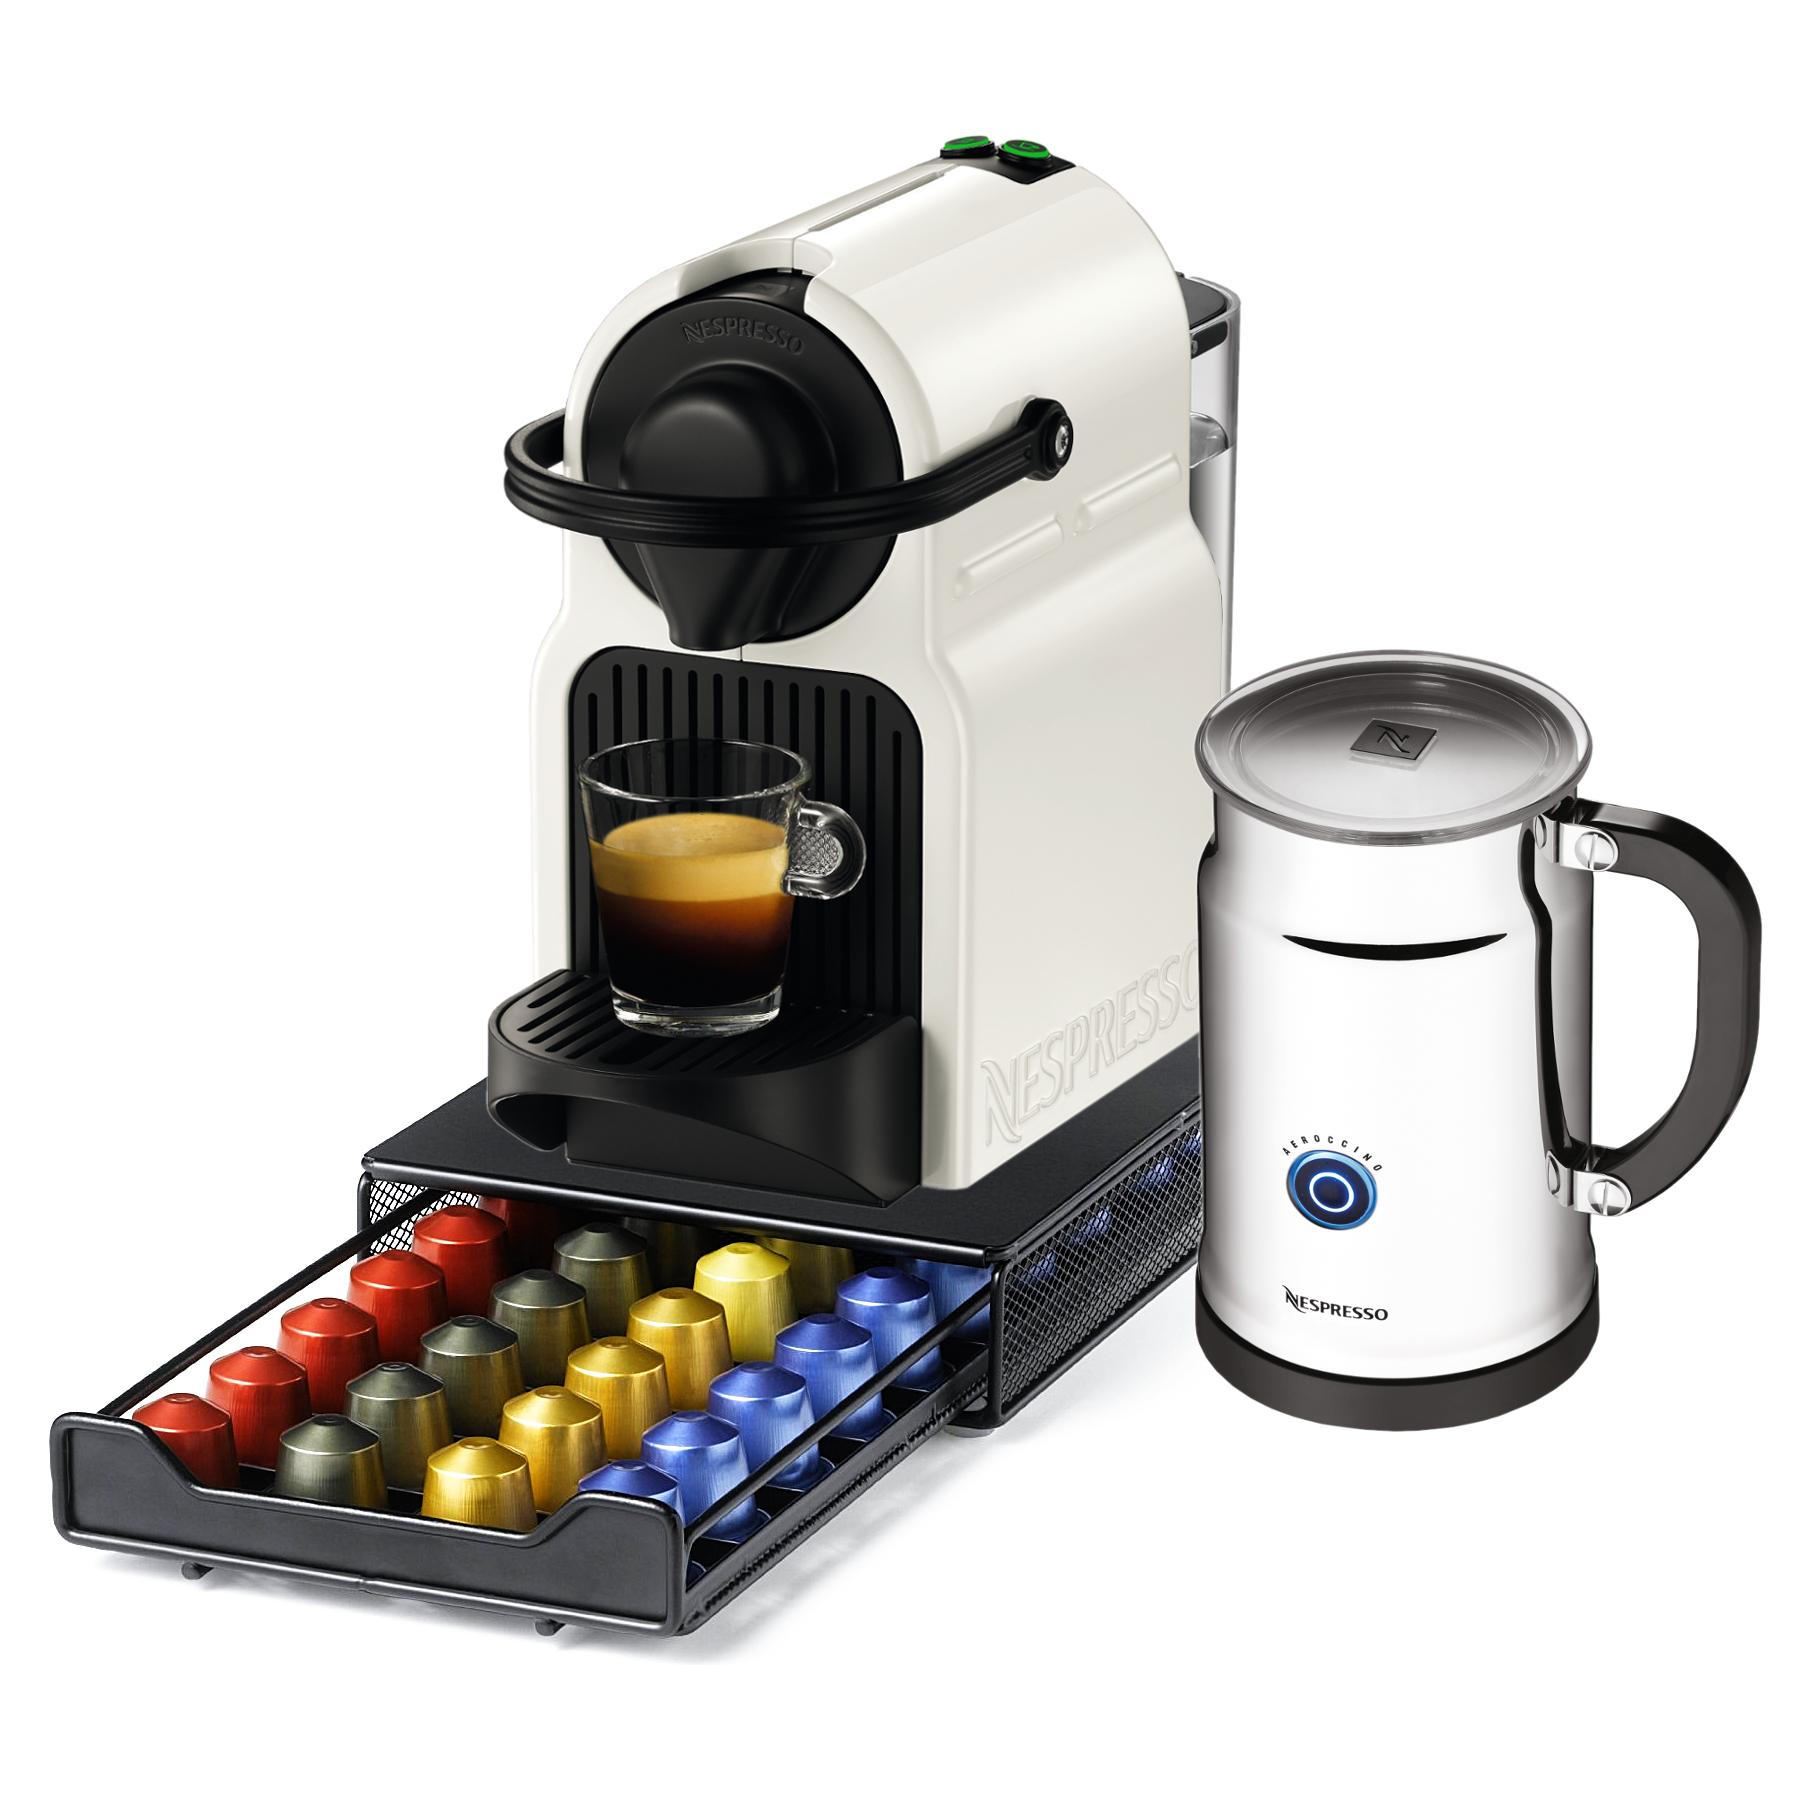 Nespresso Original Line Inissia C40 White Espresso Maker Bundle with Aeroccino Plus Milk Frother and Bonus 40 Capsule Storage Drawer